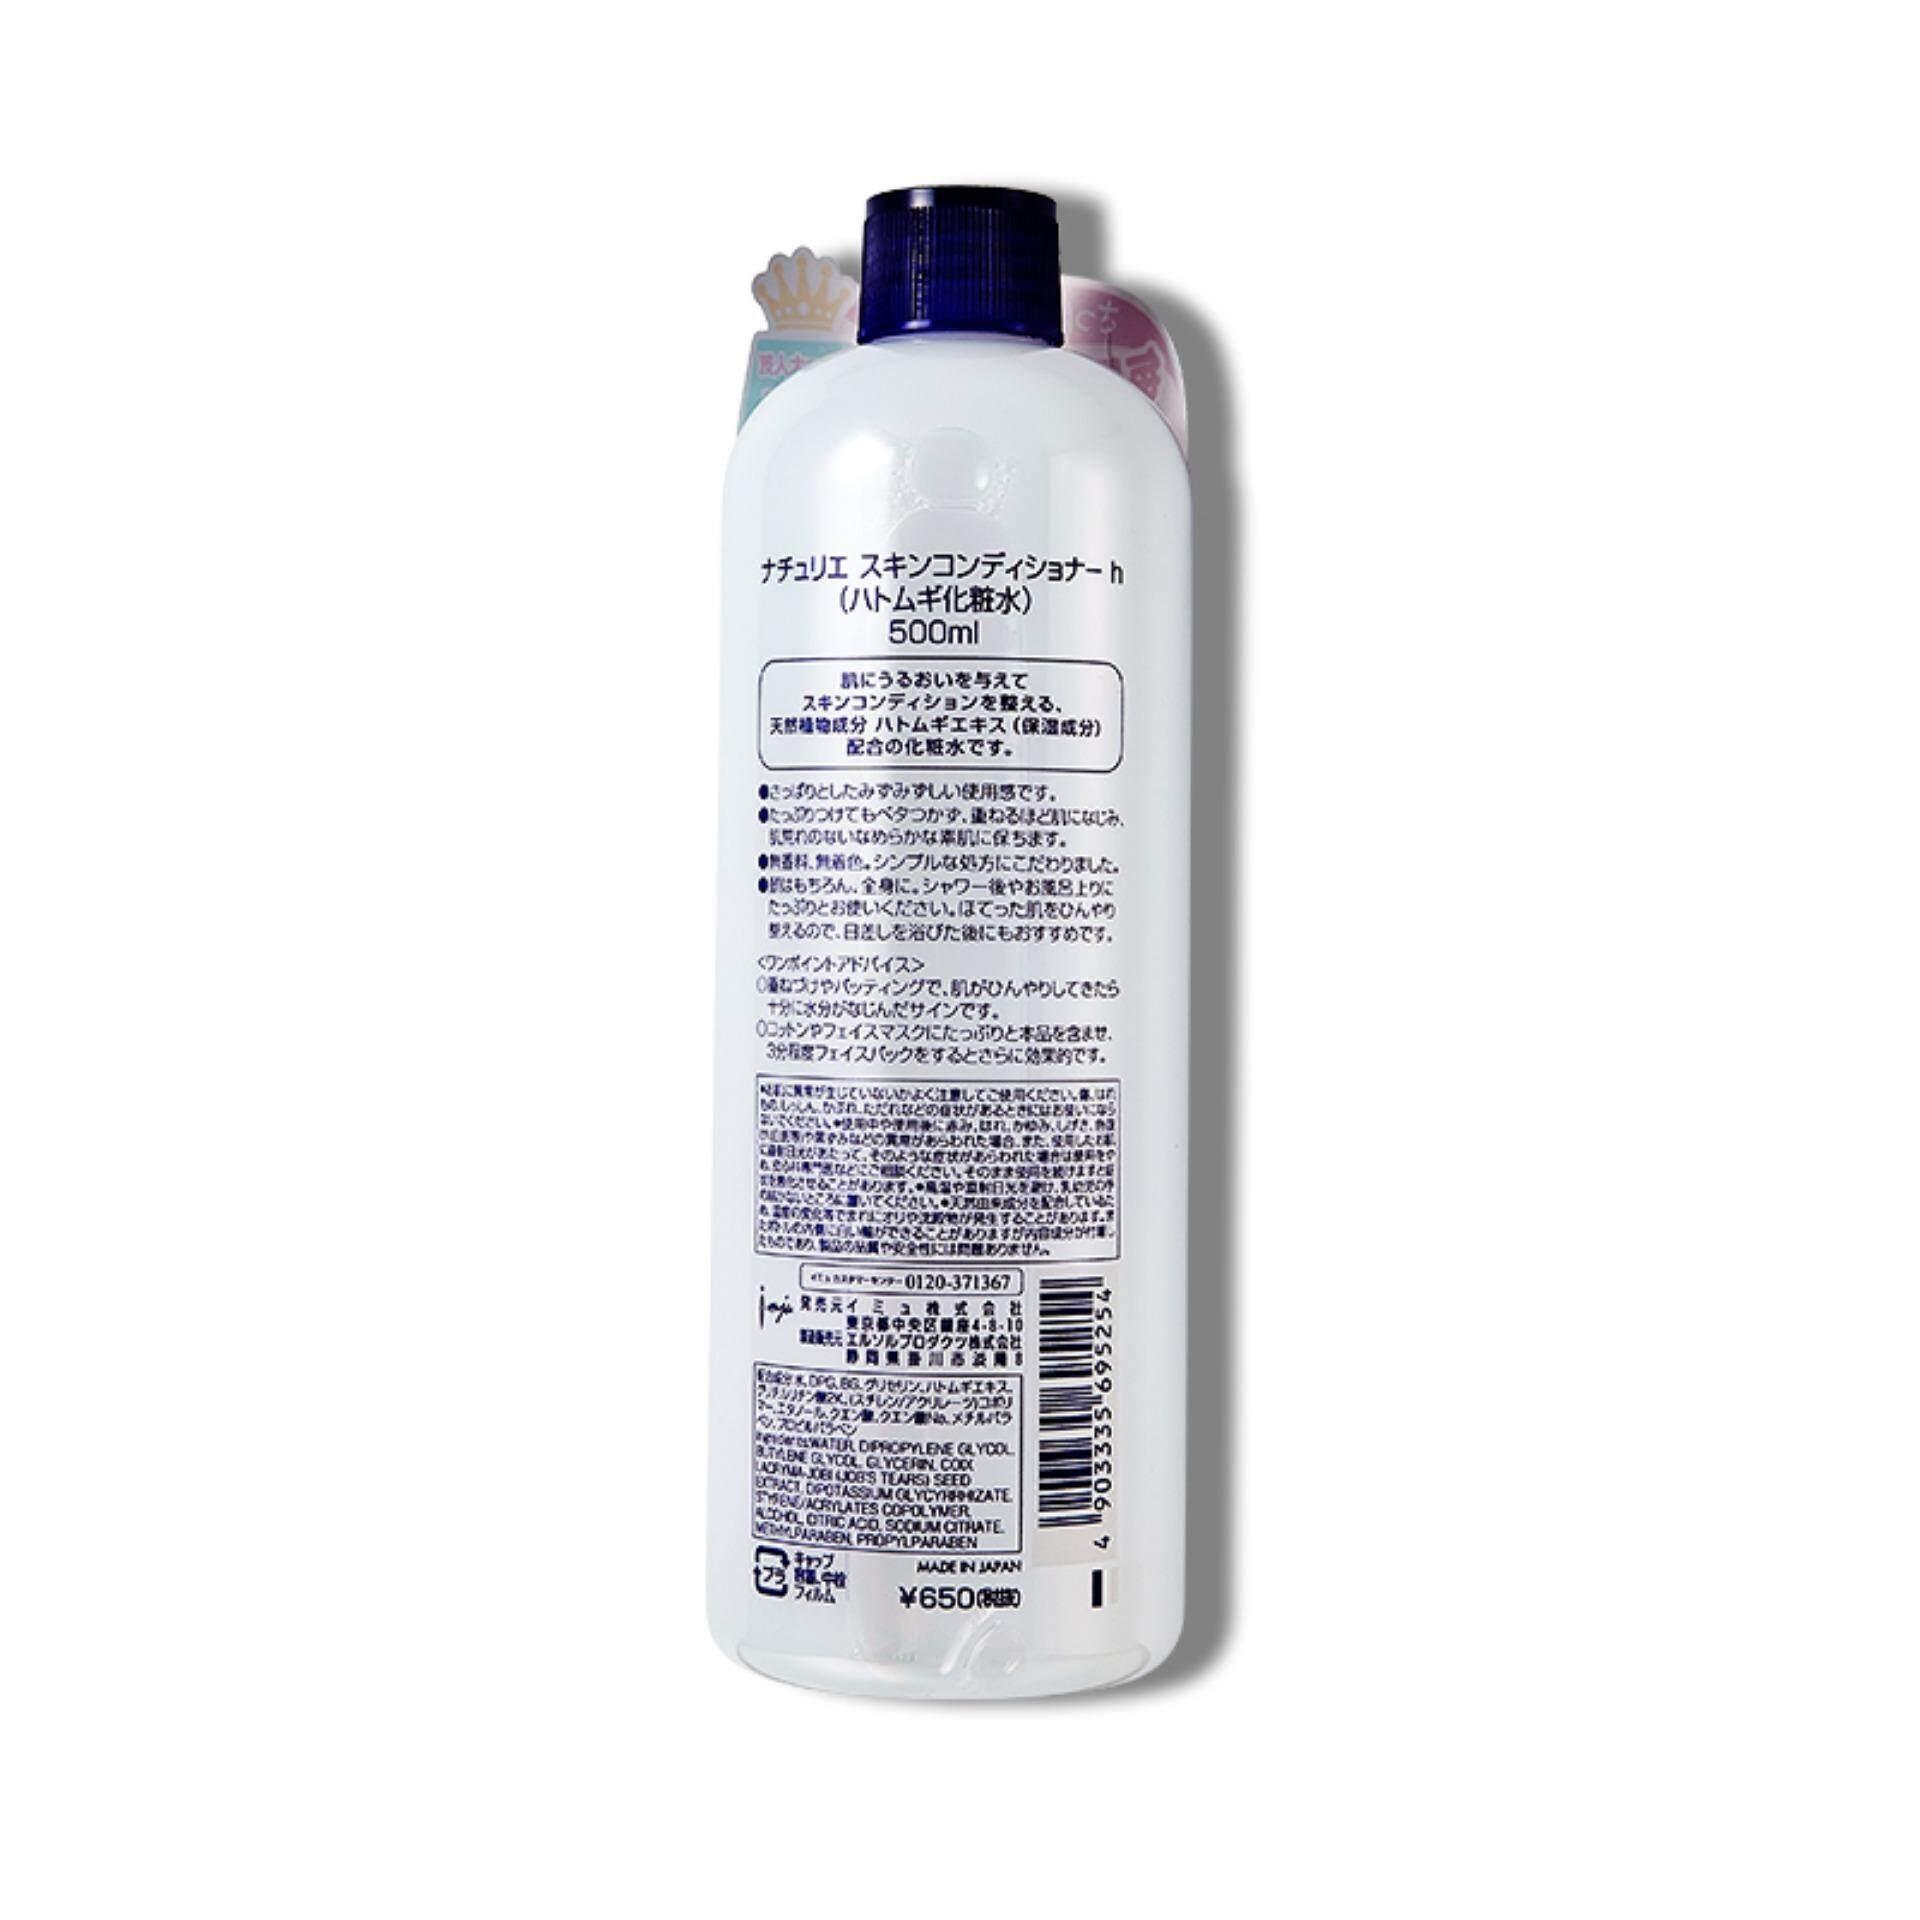 Features Naturie Skin Conditioner Hatomugi Lotion 500ml Dan Harga 3